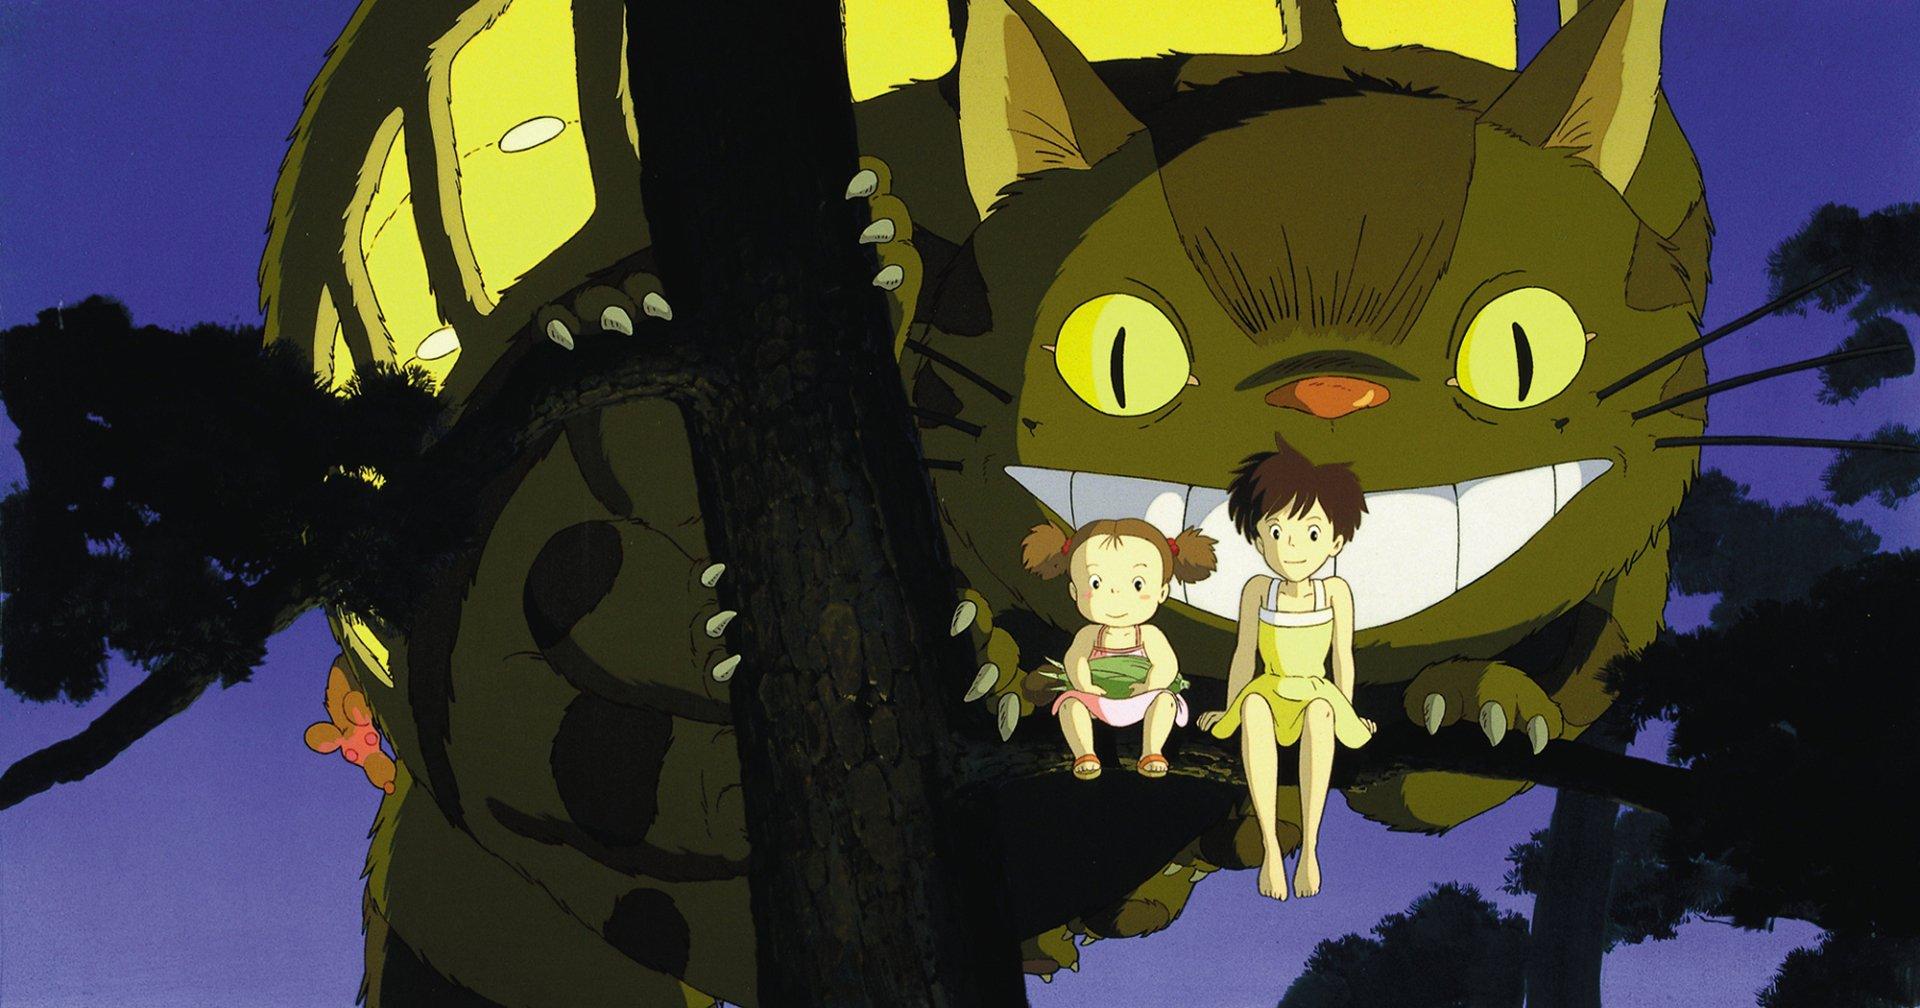 Movie - My Neighbor Totoro  Catbus (My Neighbor Totoro) Mei Kusakabe Satsuki Kusakabe Wallpaper